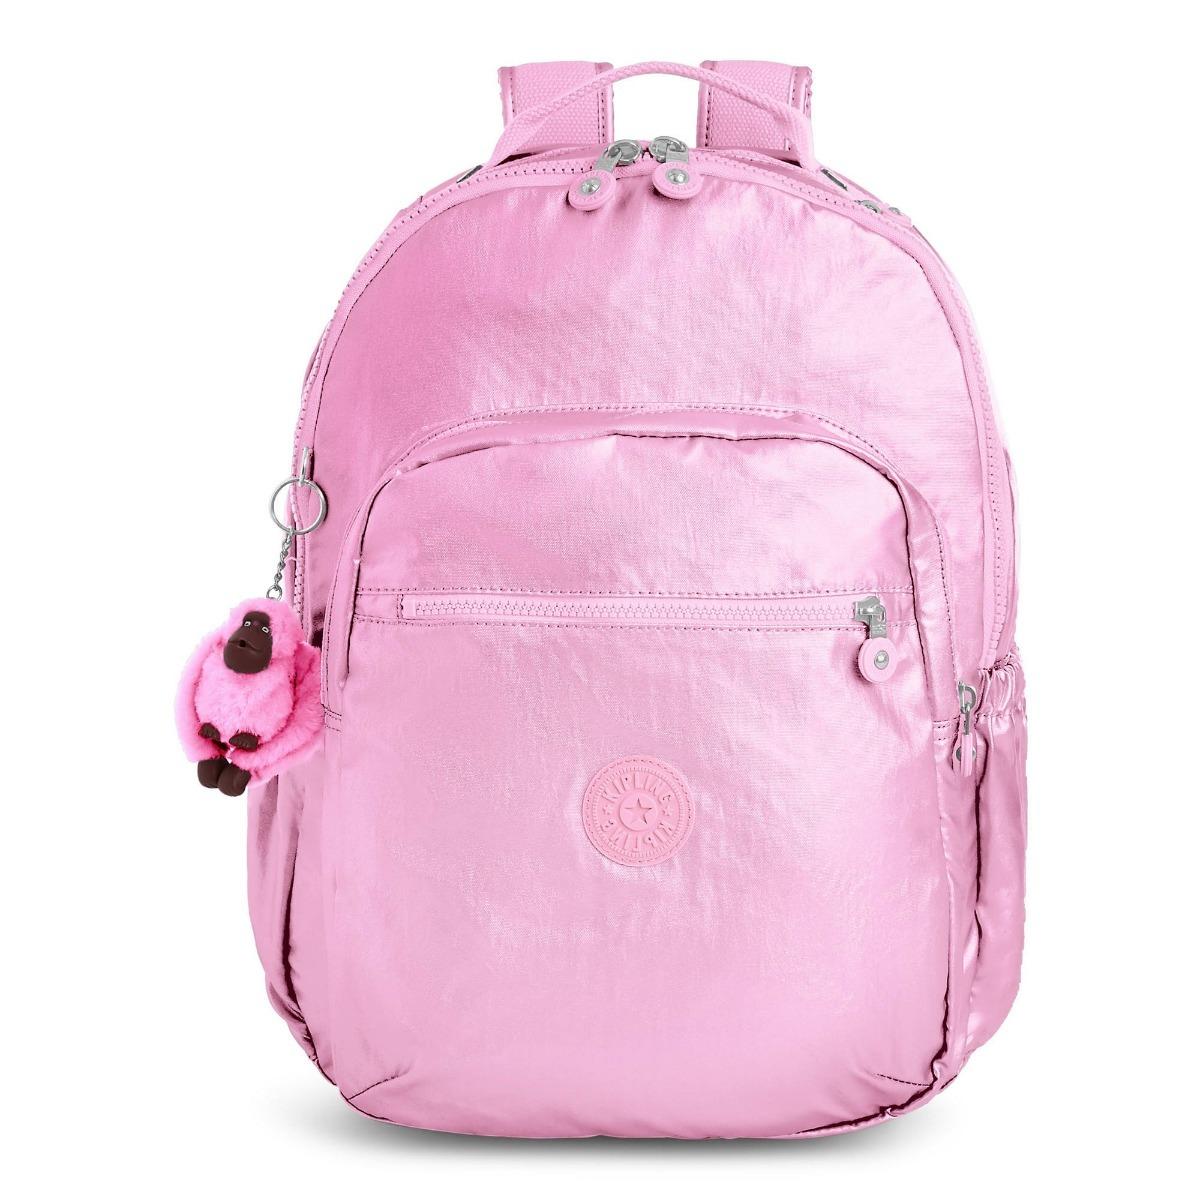 fc5ffc6e0 mochila backpack seoul go large grande rosa metálico kipling. Cargando zoom.